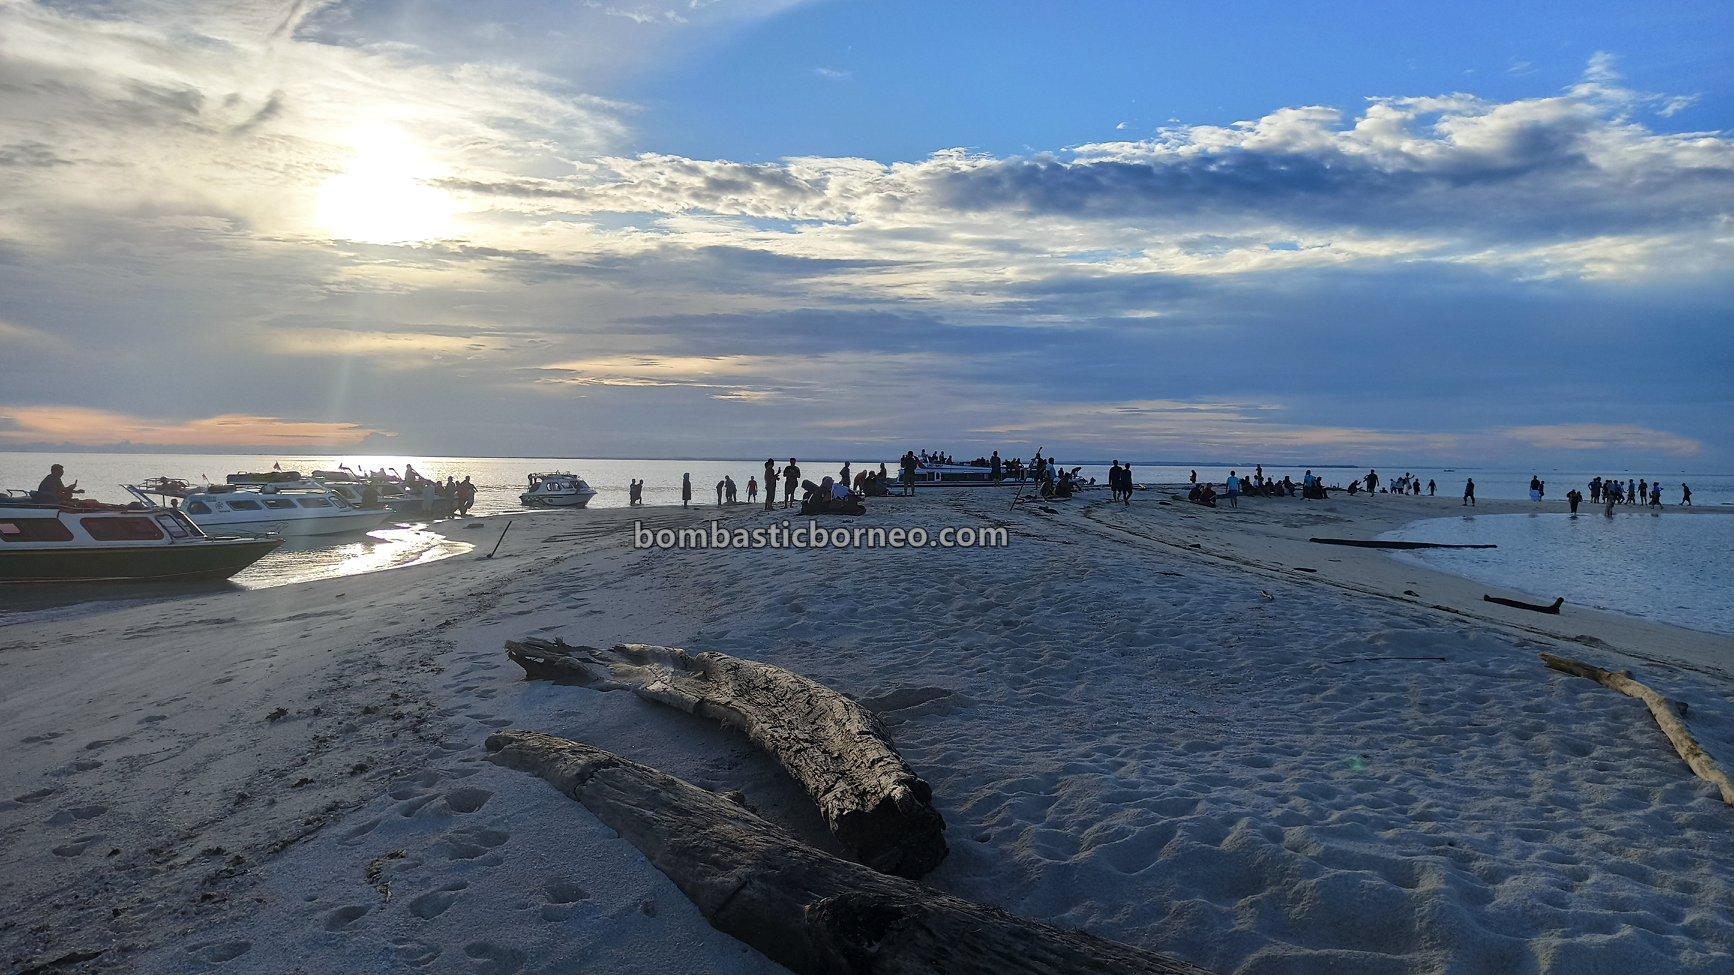 Kepulauan Derawan, white sandy beaches, backpackers, Destination, exploration, nature, hidden paradise, holiday, vacation, East Kalimantan, wisata alam, Tourism, Borneo, 婆罗洲旅游景点, 印尼东加里曼丹,